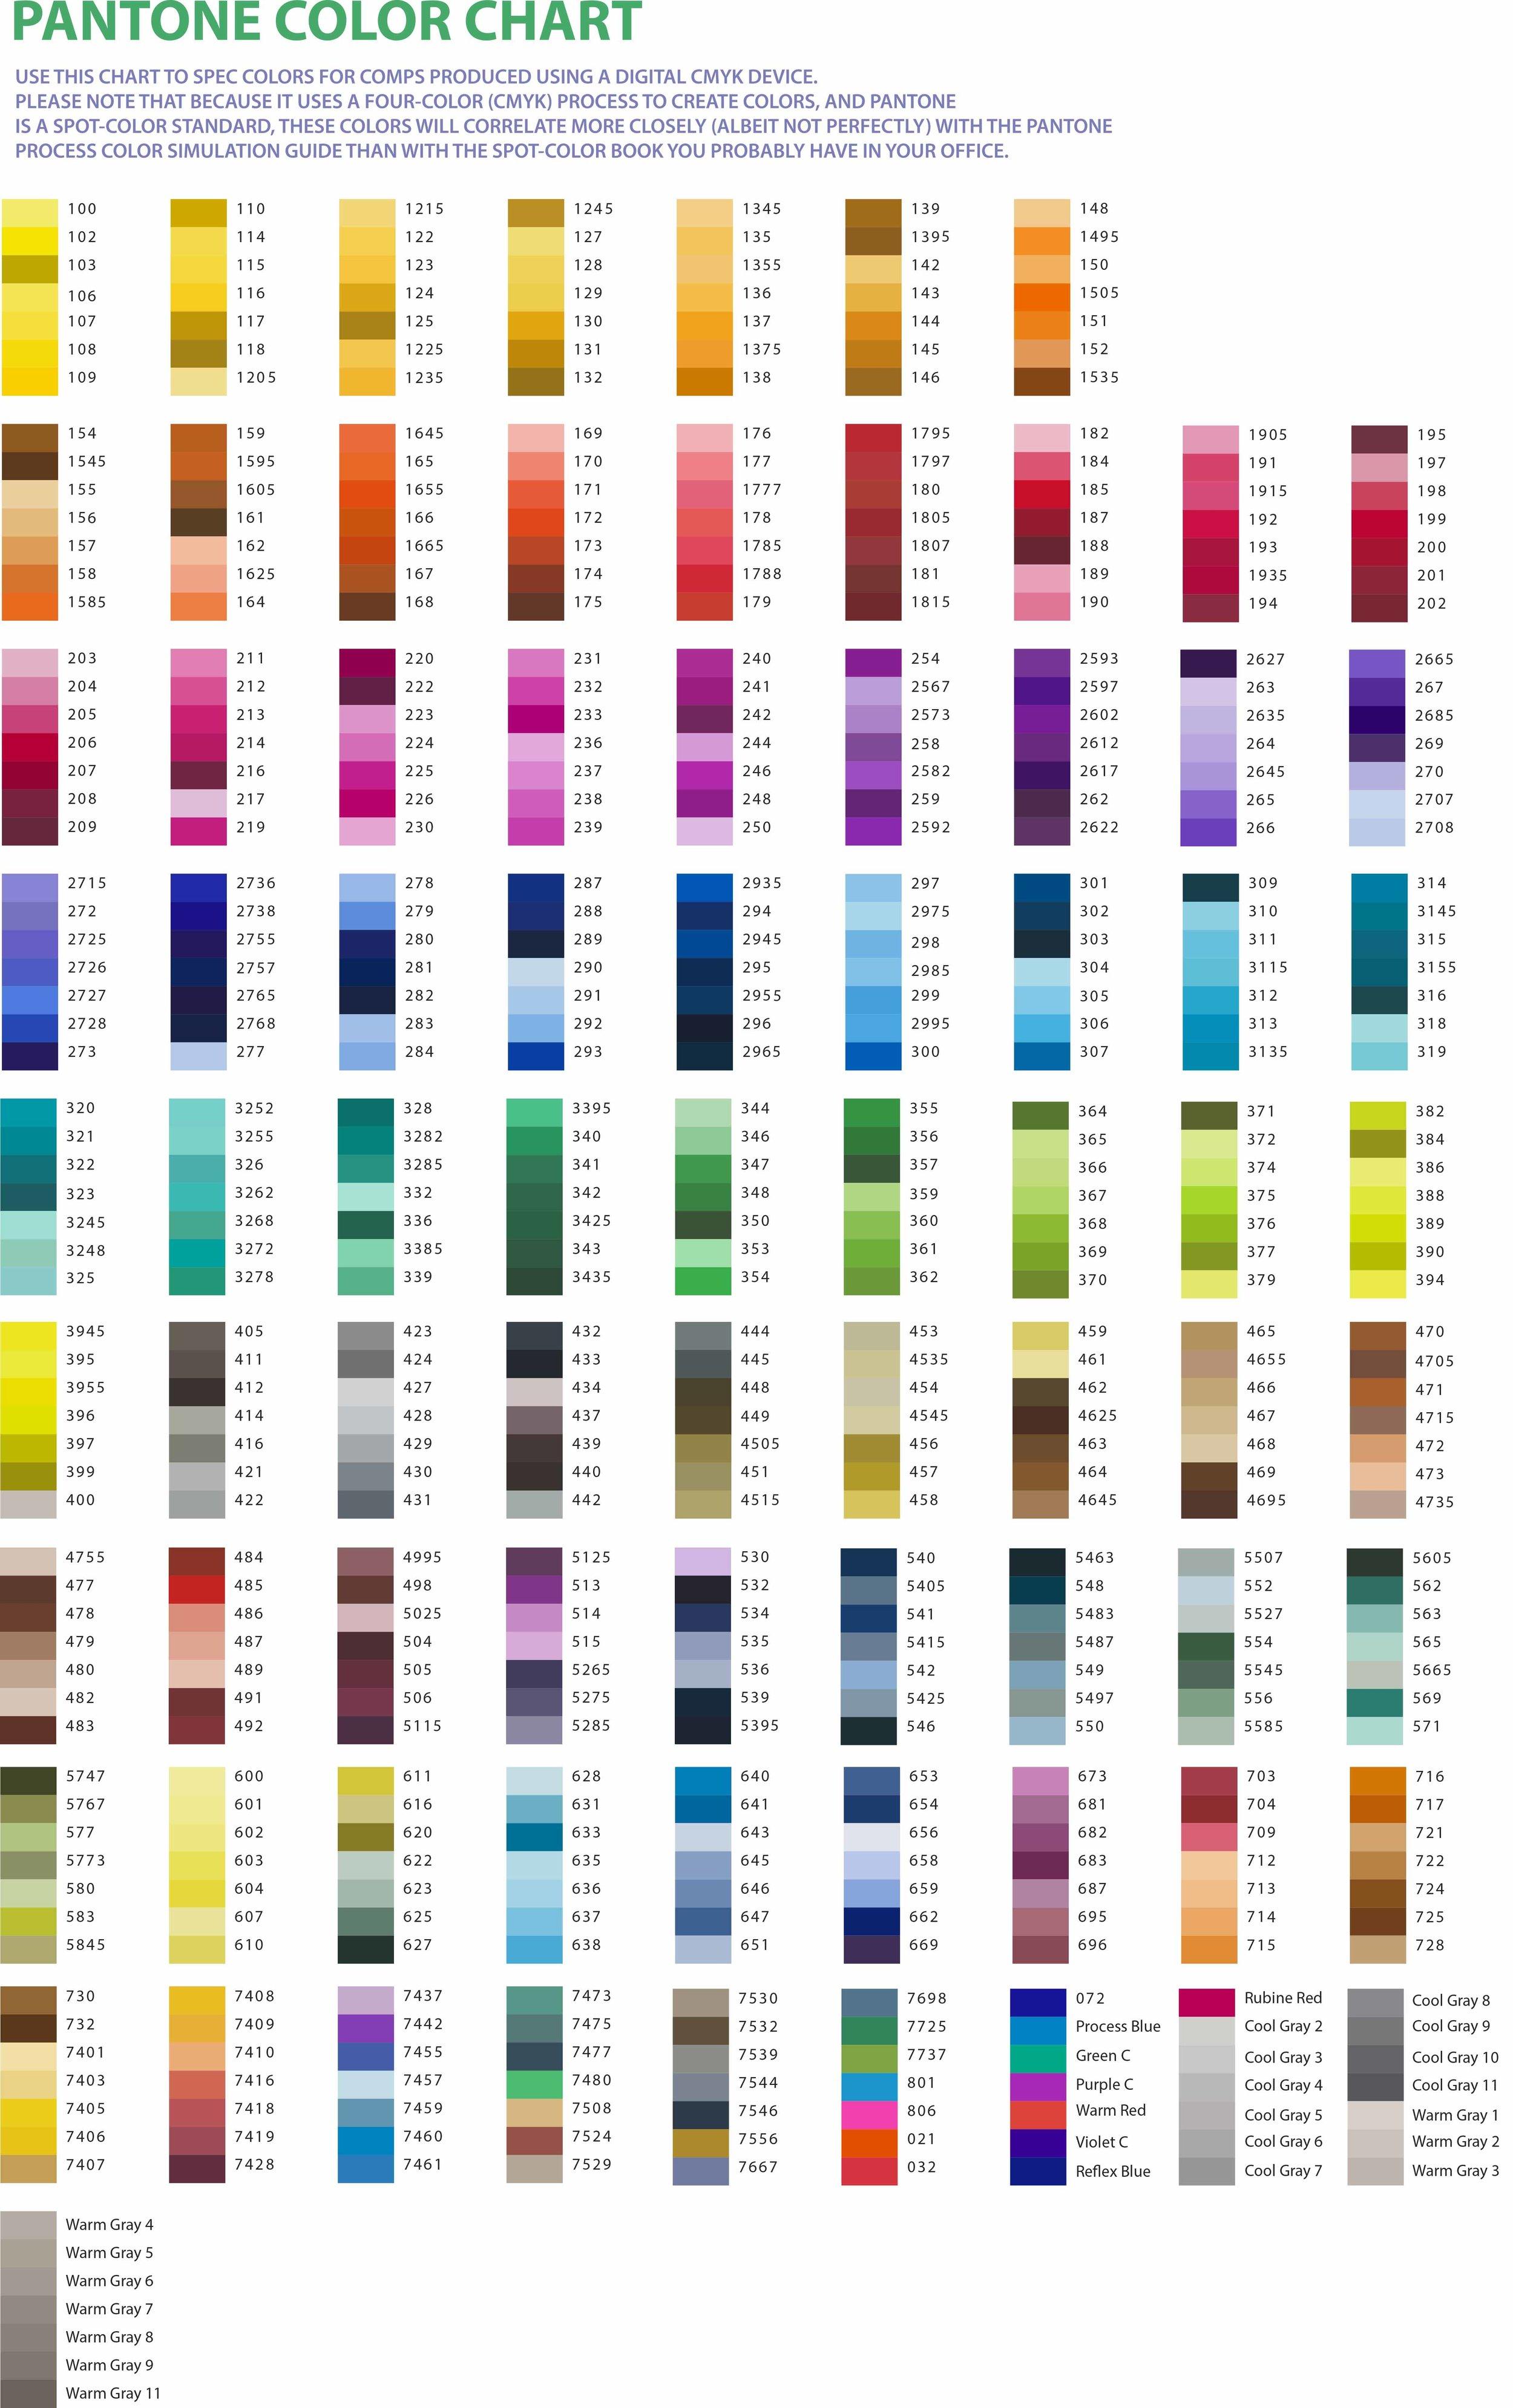 iDex PMS Color Chart 2017.jpg